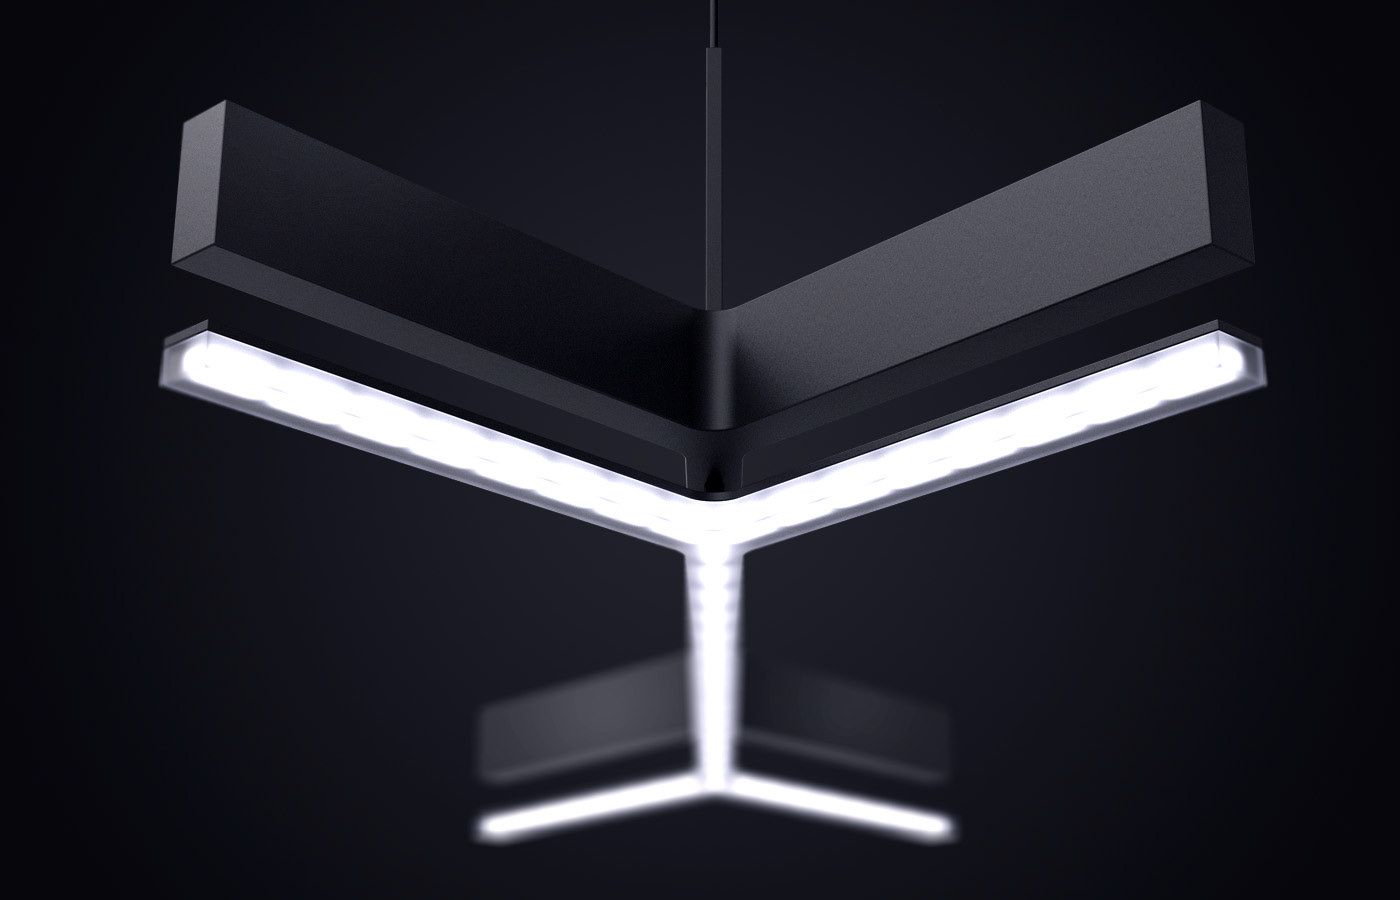 design designer light product design  sketch Suspension